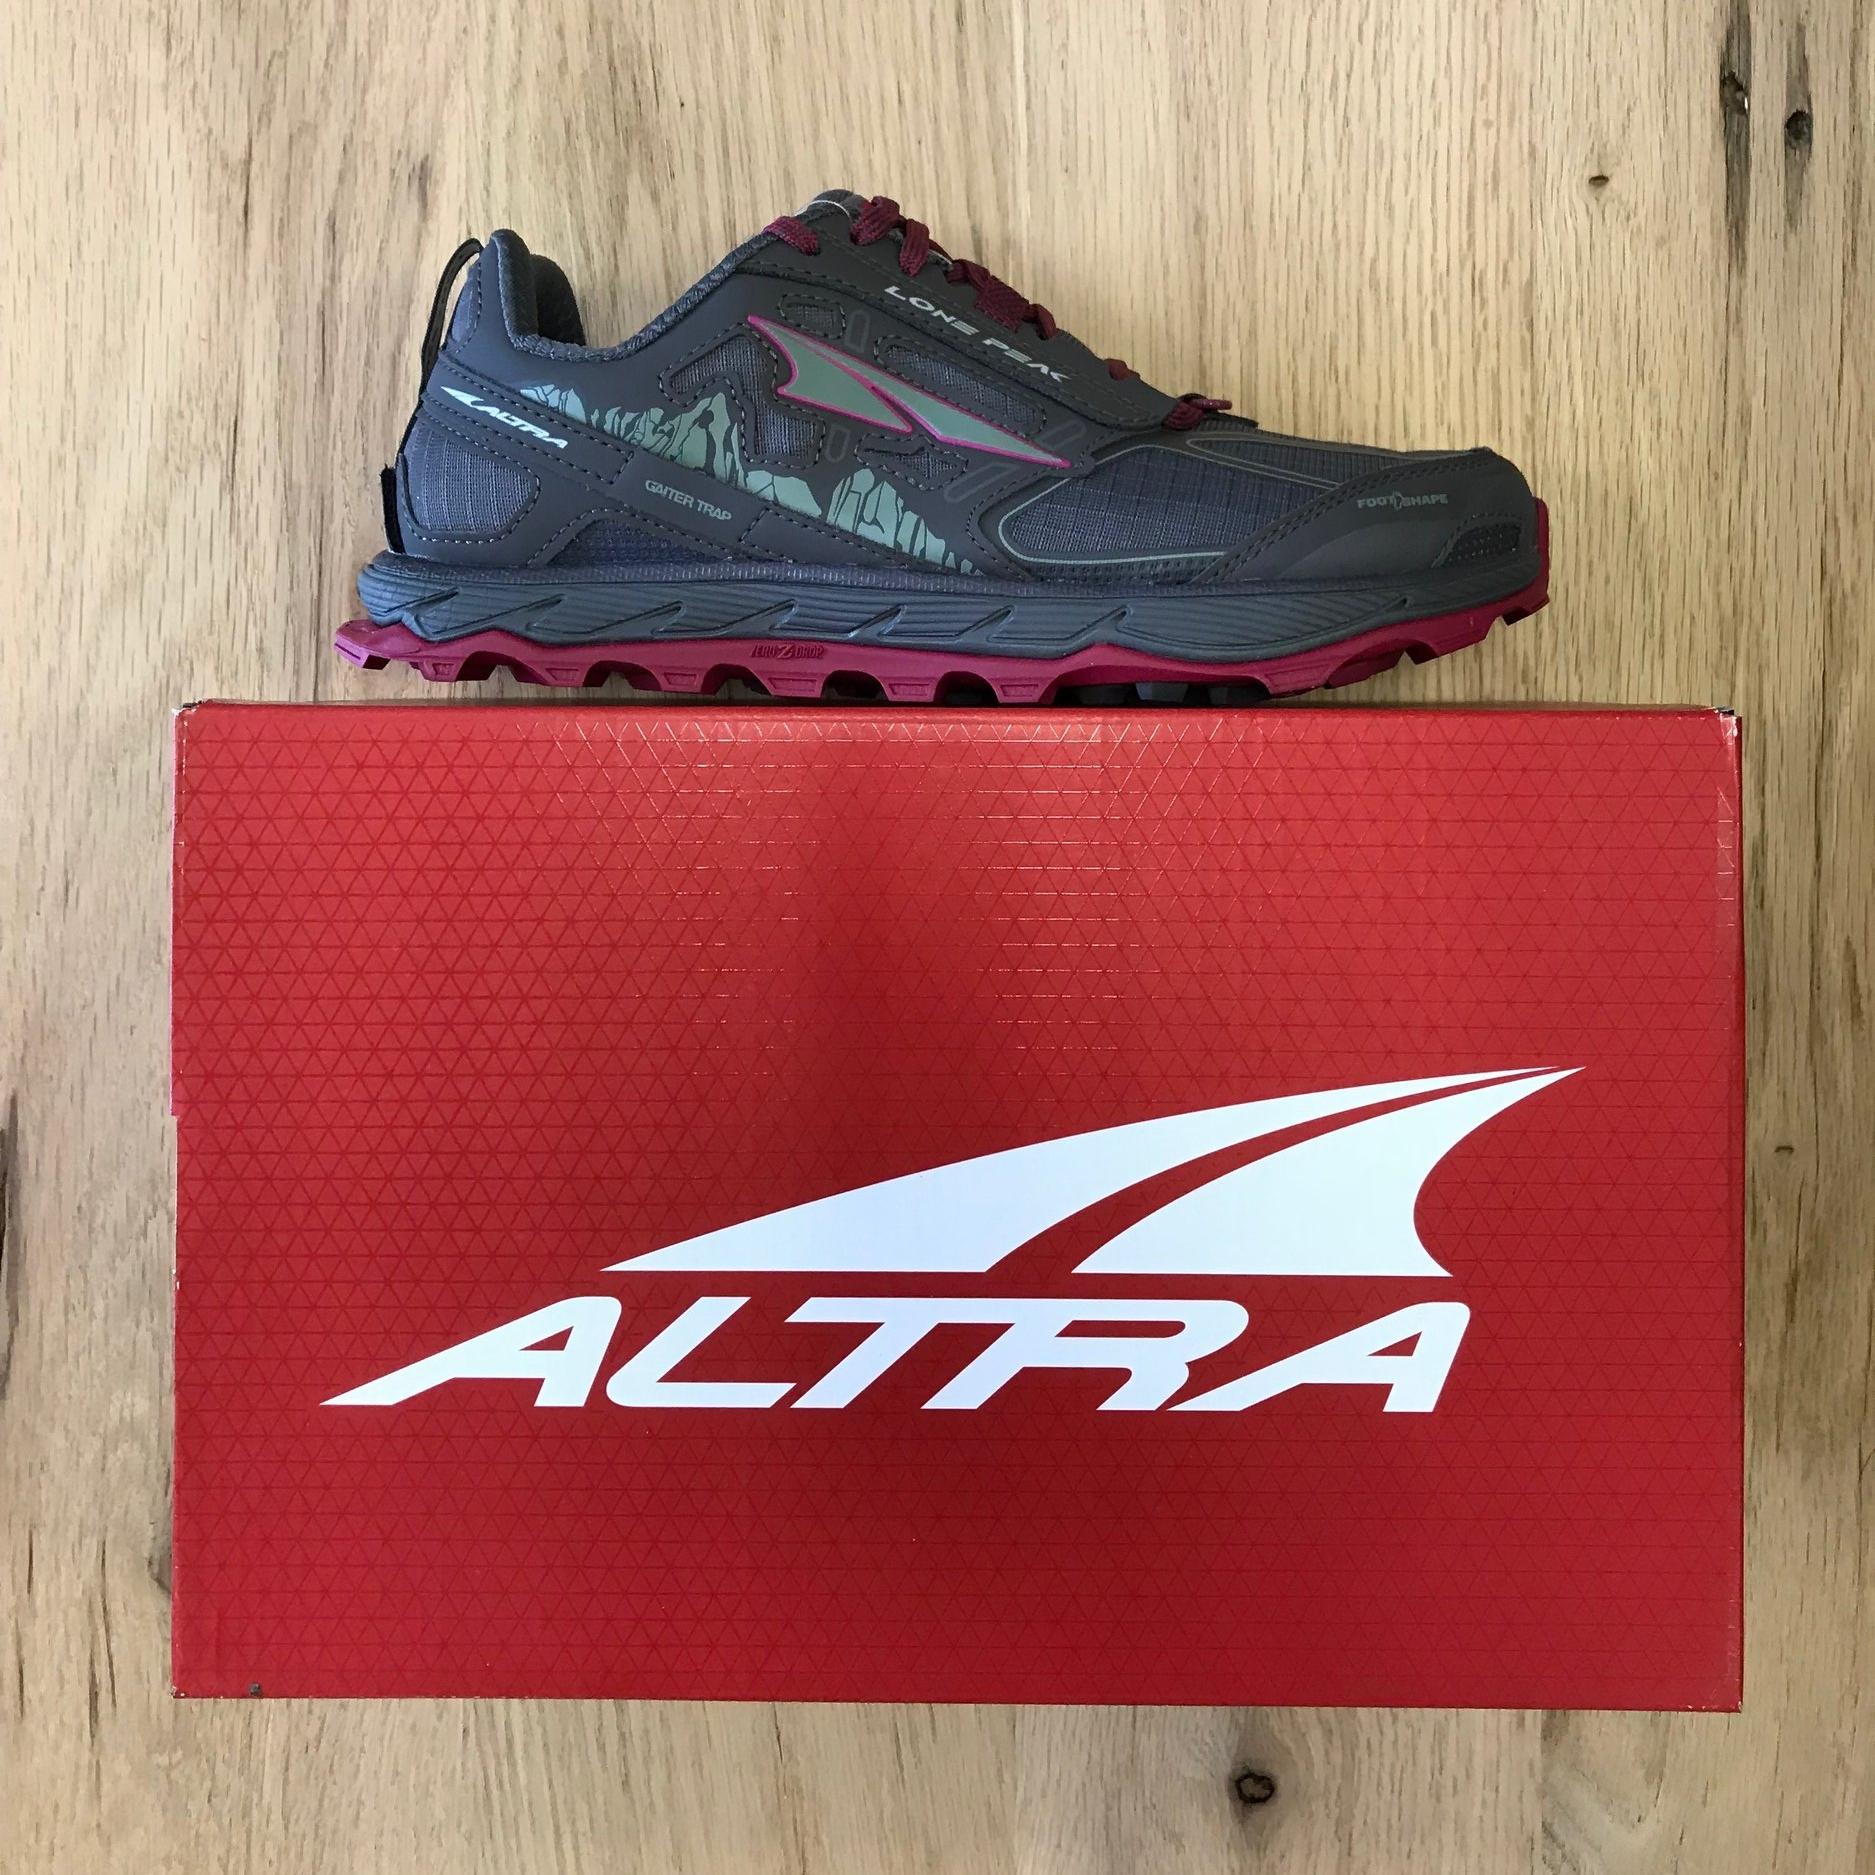 Altra Lone Peak 4.0 - Women's